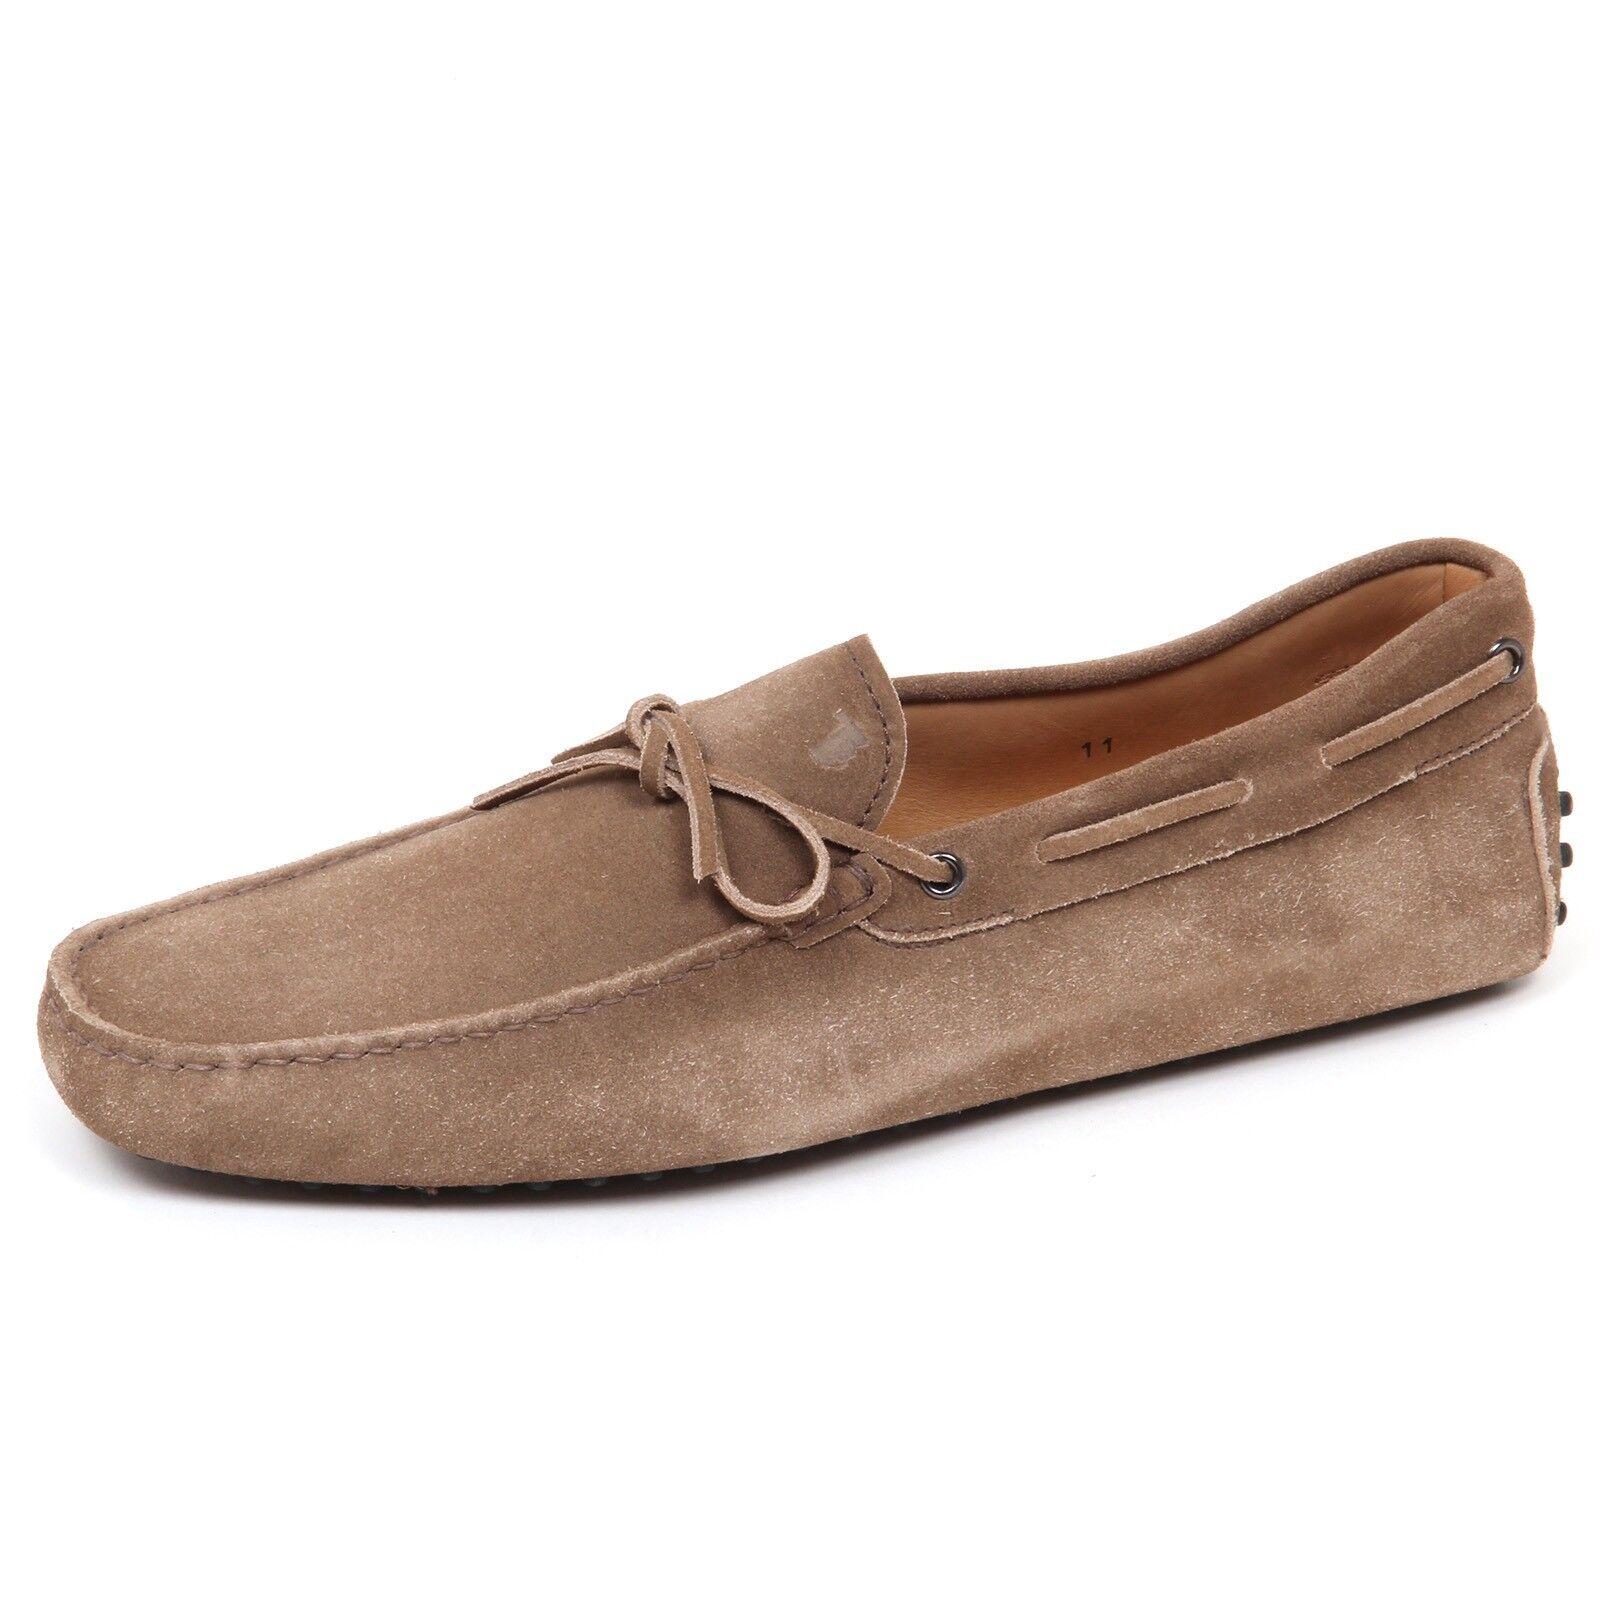 E2984 mocassino uomo suede TOD'S marrone chiaro scarpe suede uomo loafer shoe man 2a012d